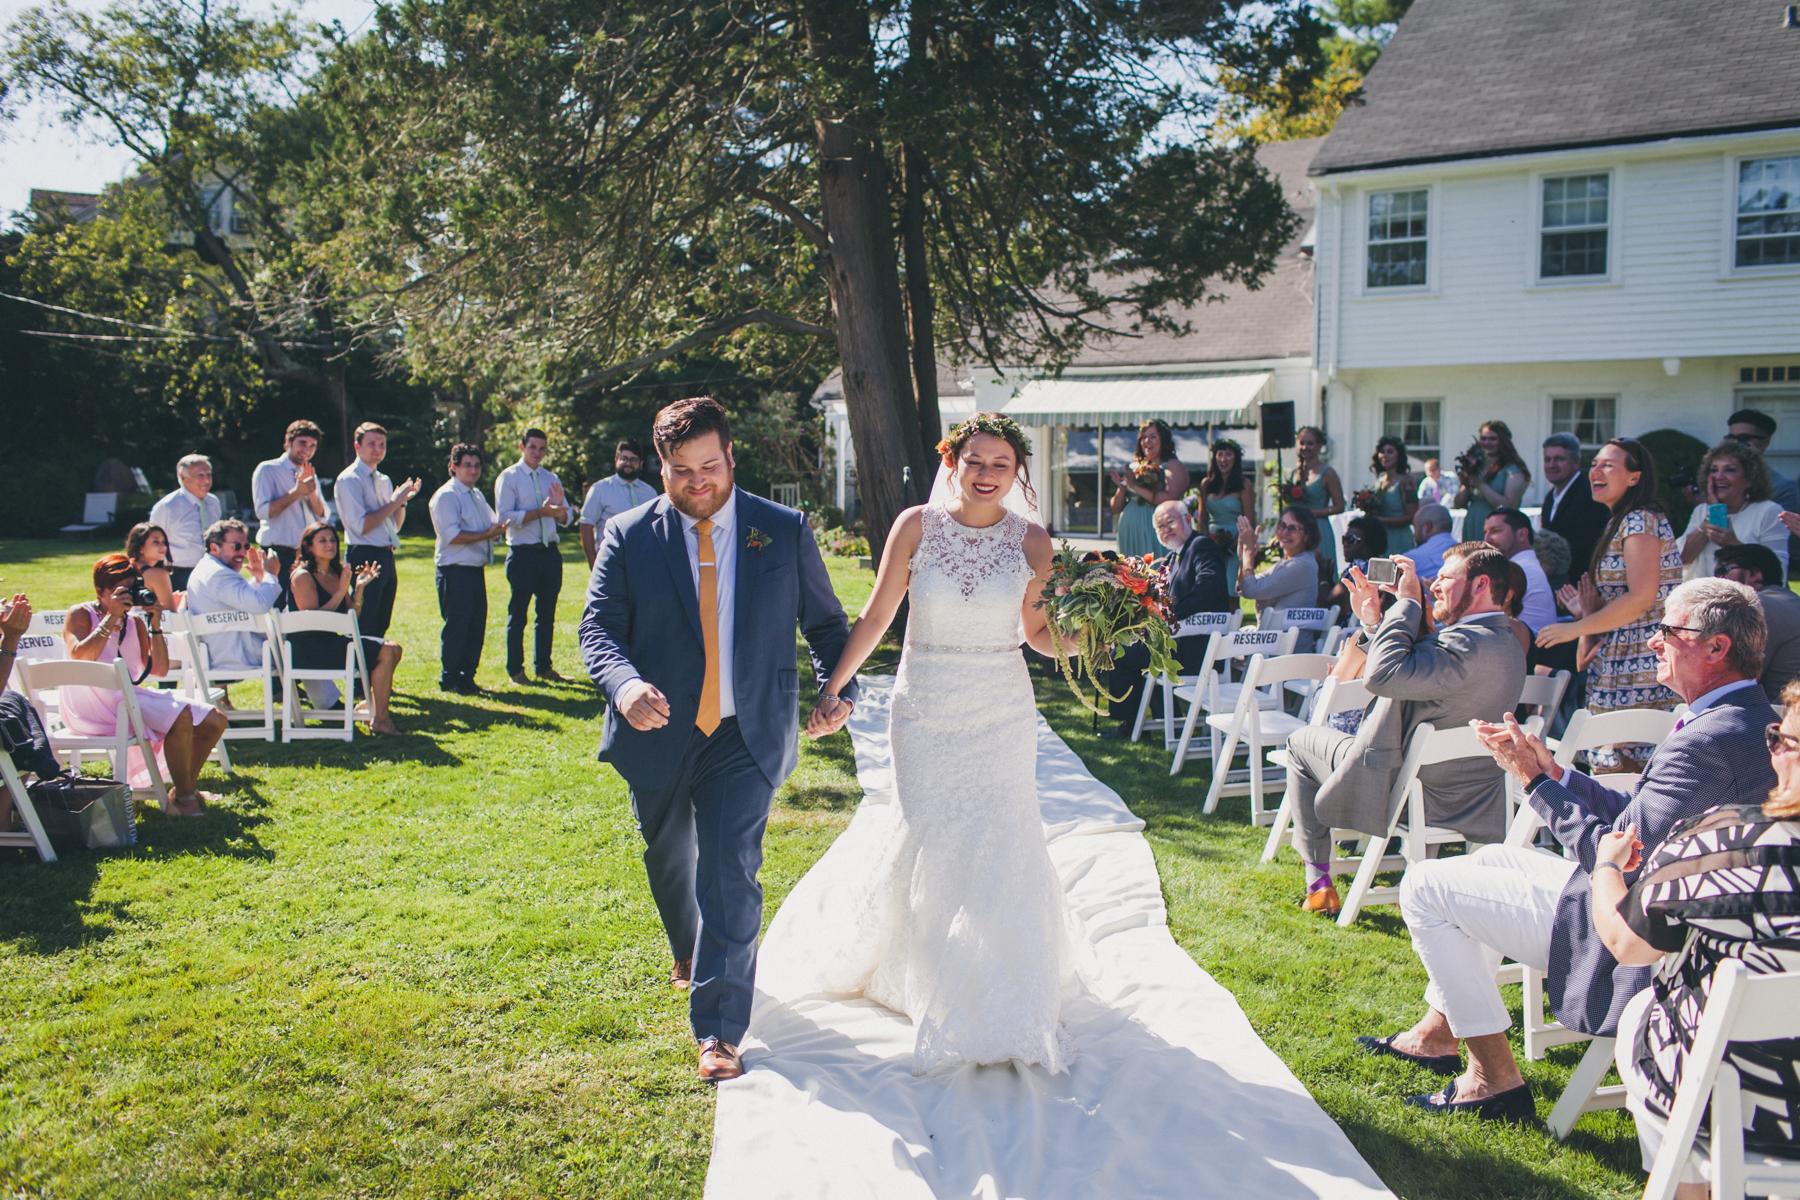 Long-Island-Documentary-Wedding-Photography-Summer-Tent-Wedding-in-New-York-75.jpg